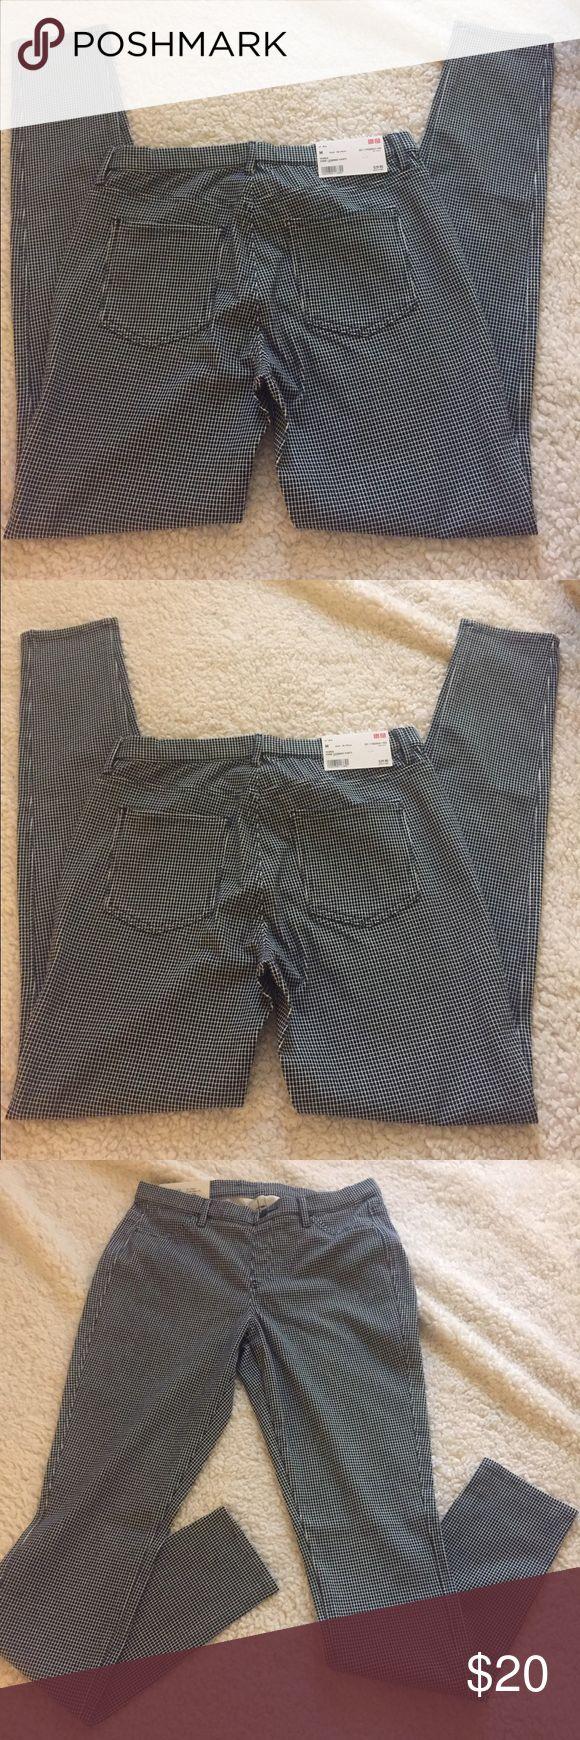 💥💥UNIQLO leggings pants💥💥 ⚡️UNIQLO⚡️Women blue/ white print leggings! Very soft material 56%cotton 17%polyester 17%spandex! 😍💥 Uniqlo Pants Leggings